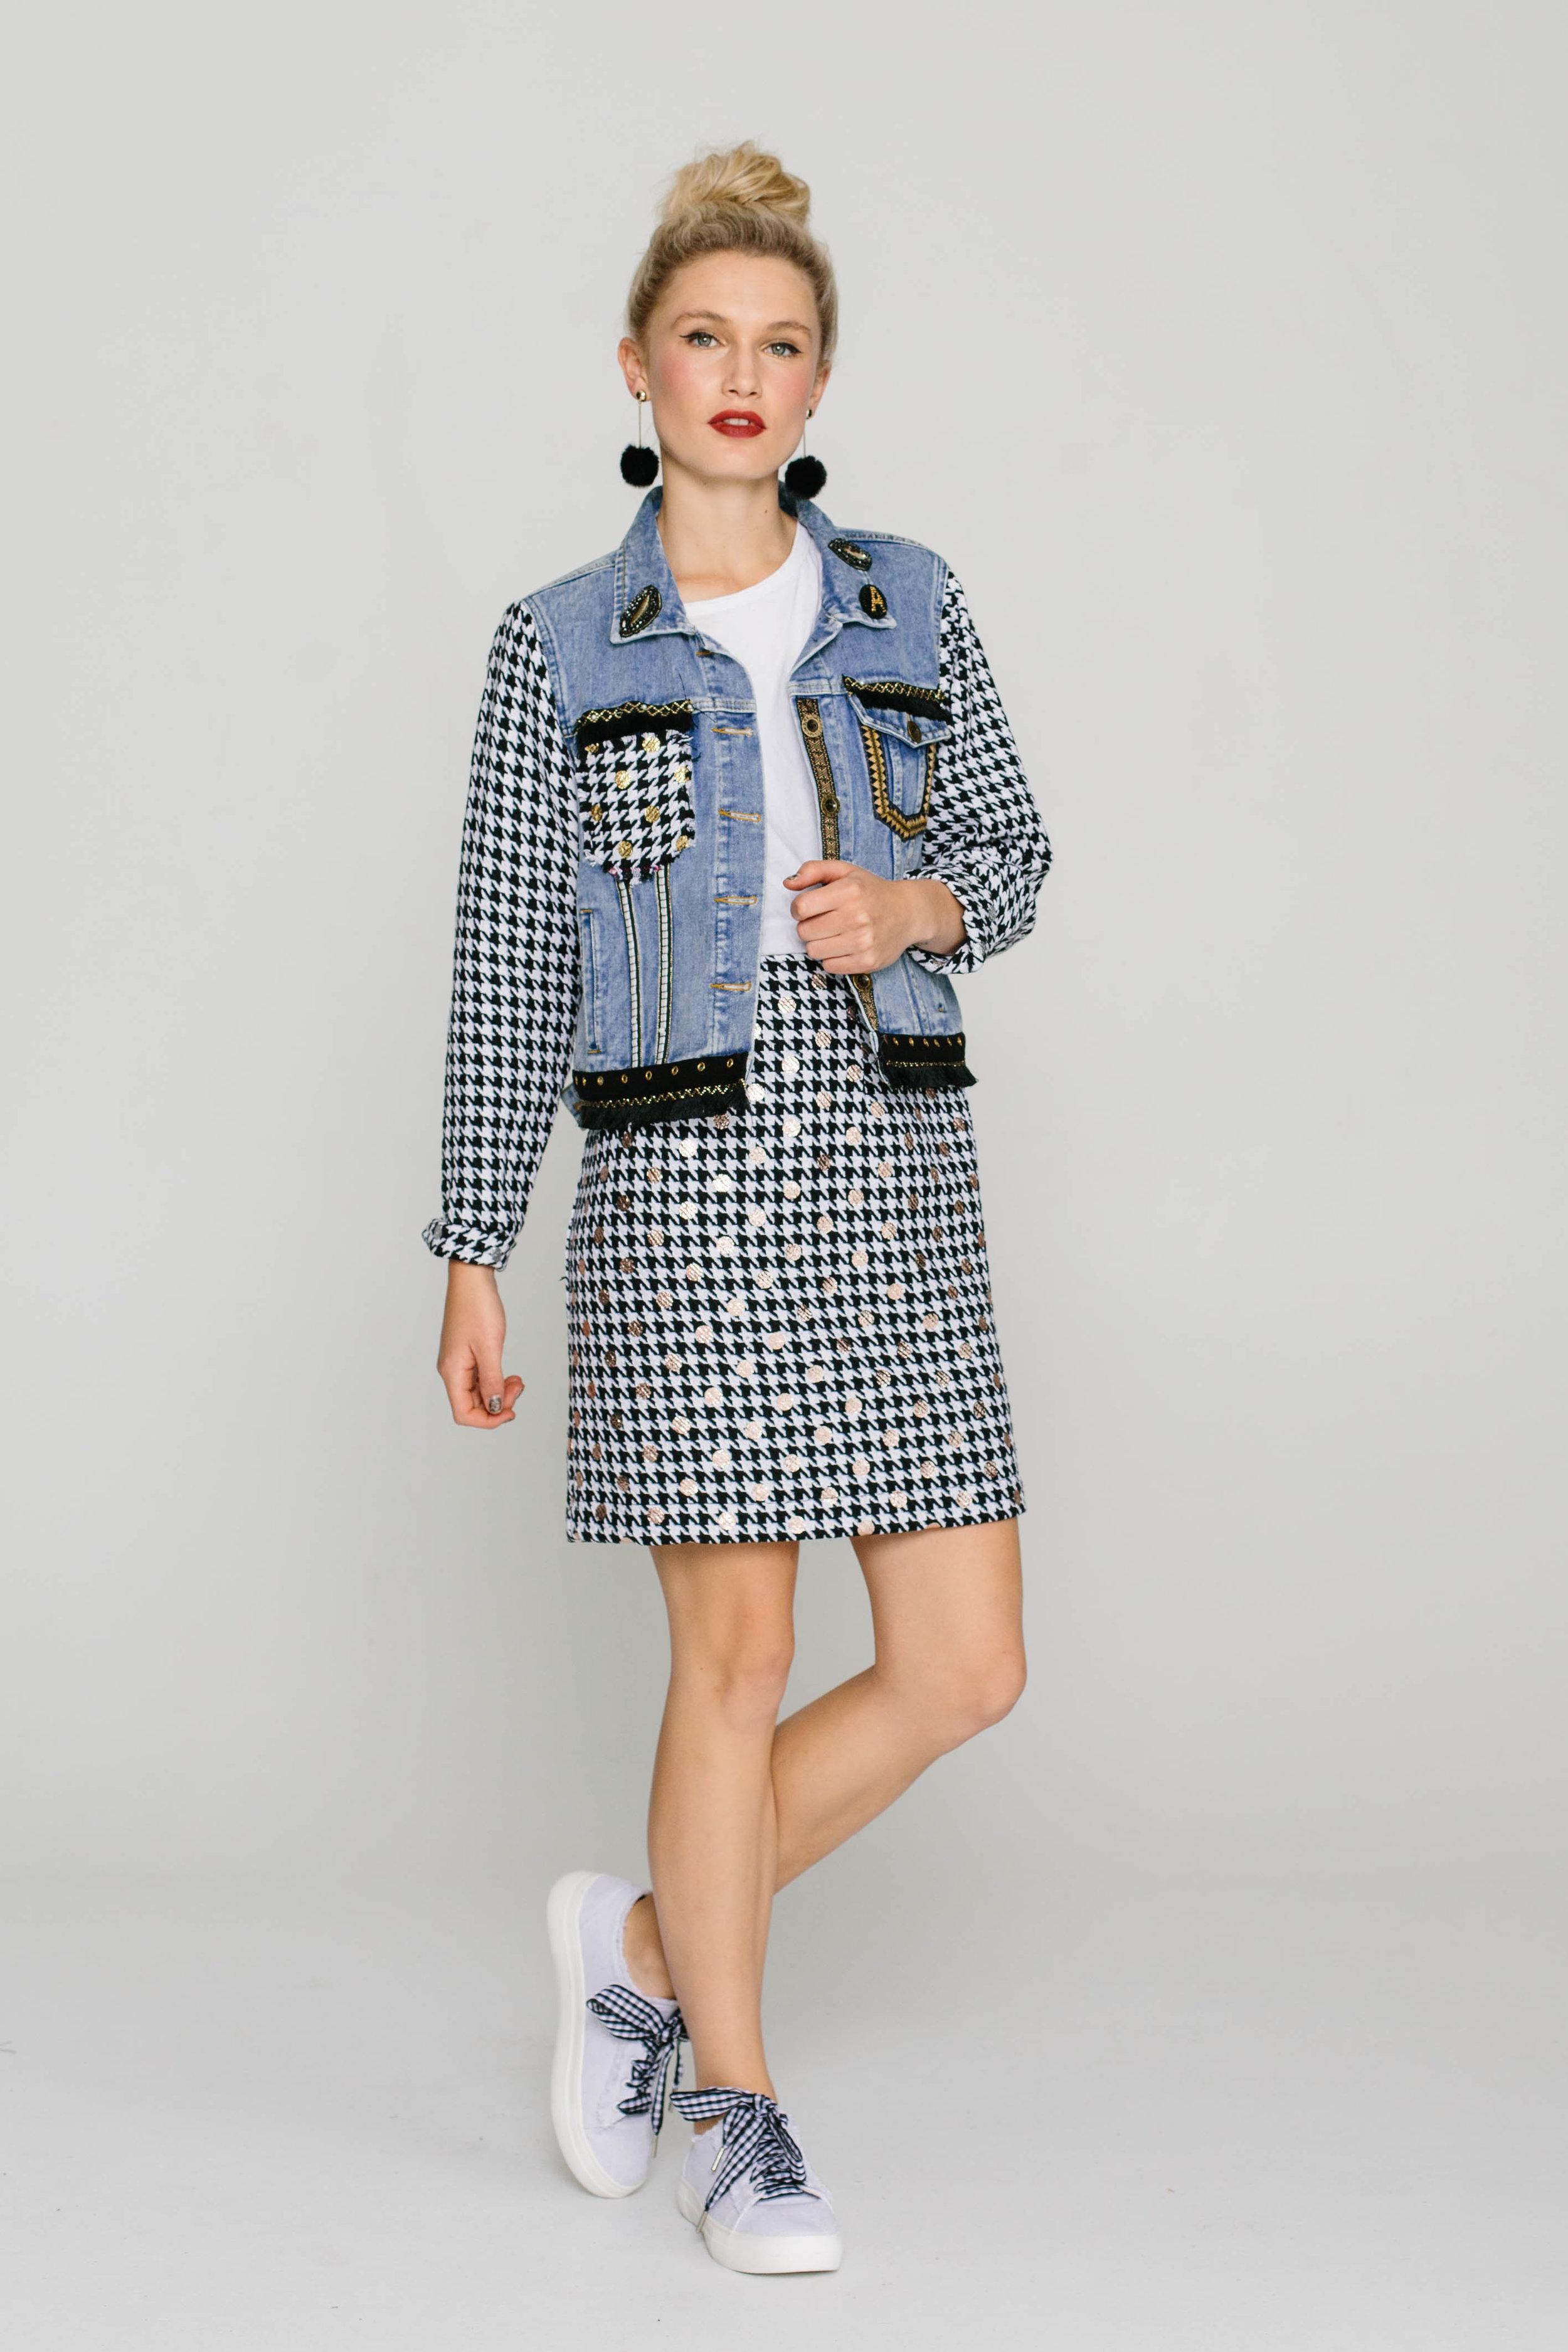 6199WB Denim Jacket 5740W Straight Skirt Chanel Silver